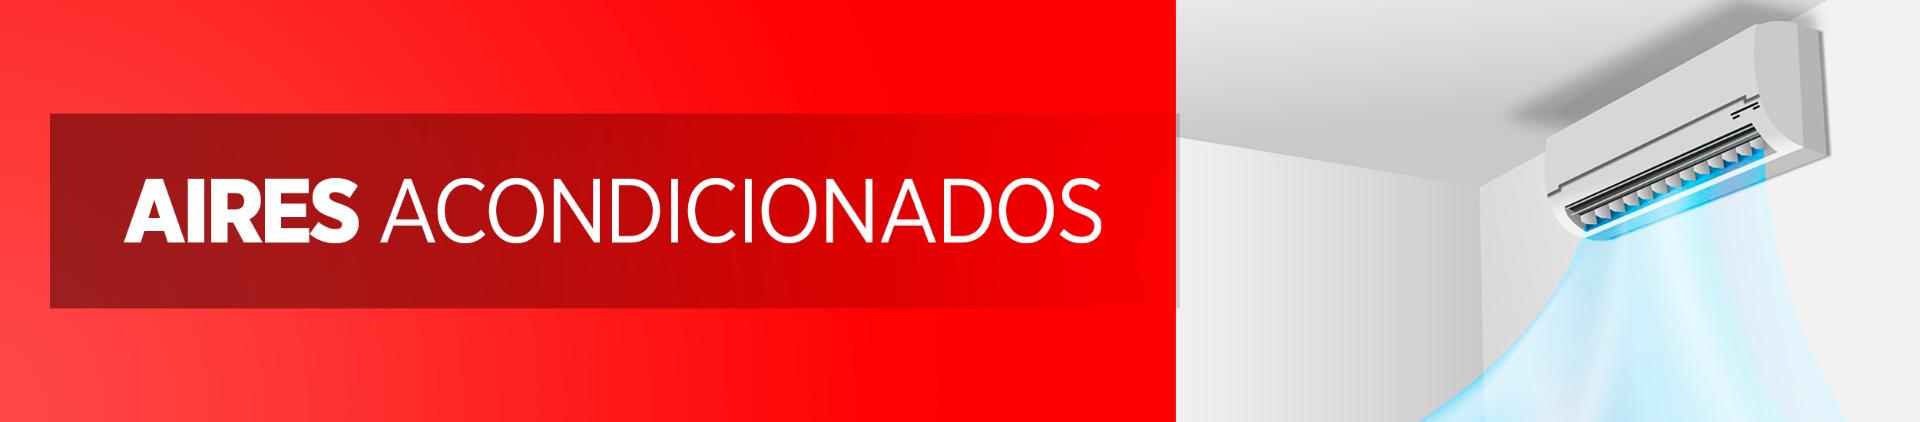 Aires Acondicionados | Dismac